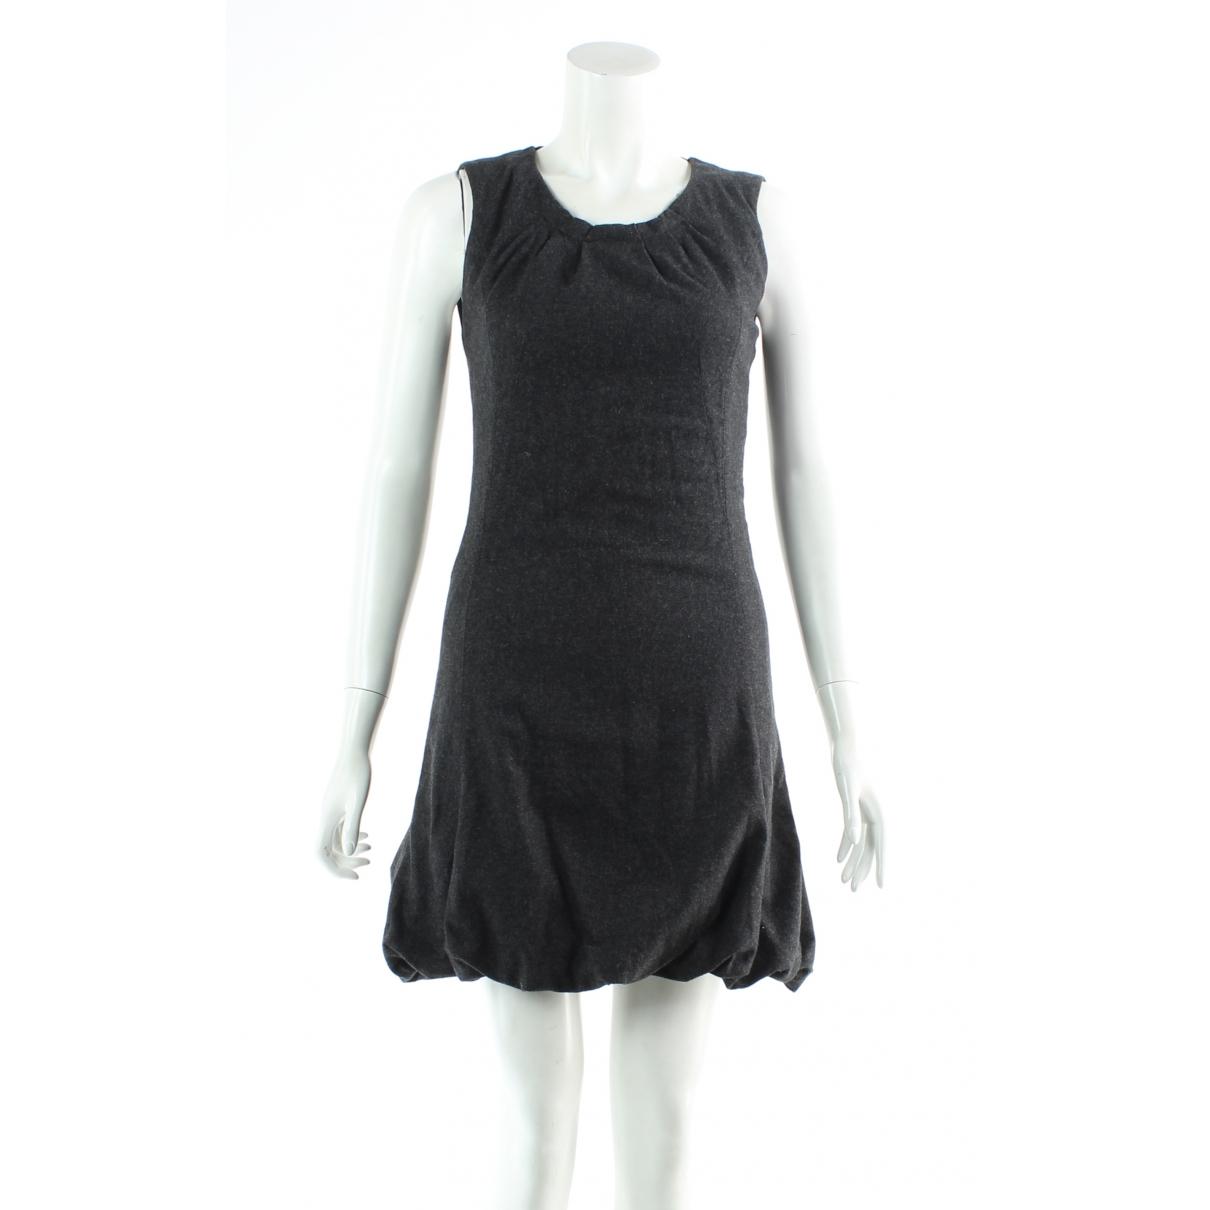 Vestido de Lana D&g